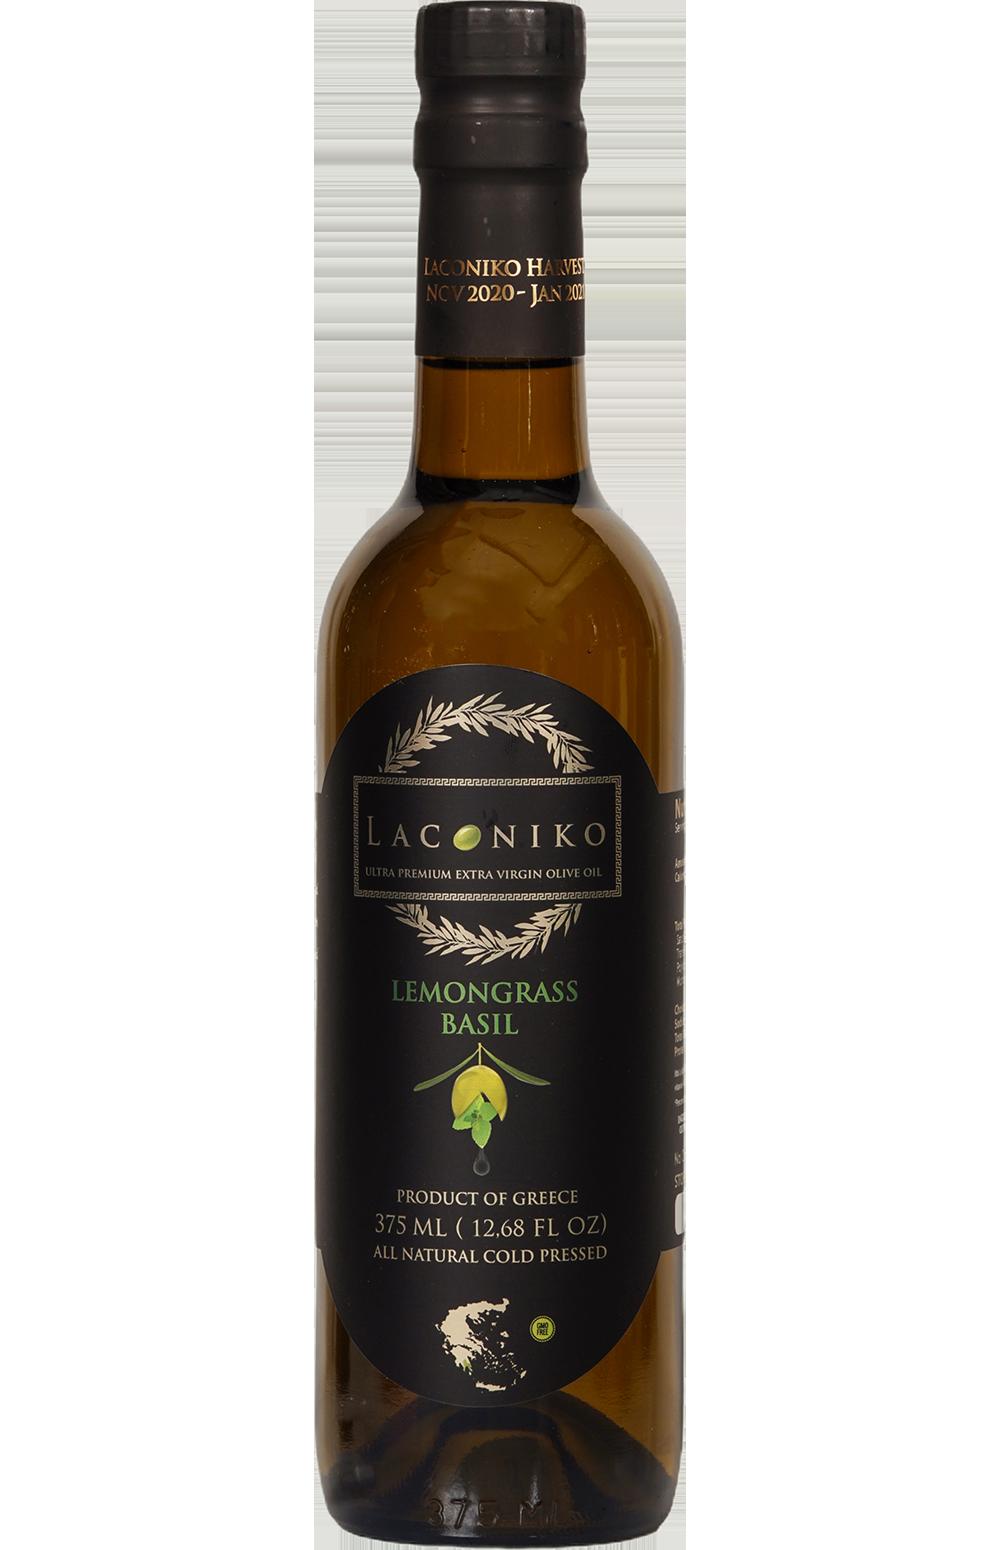 Laconico Lemongrass Basil